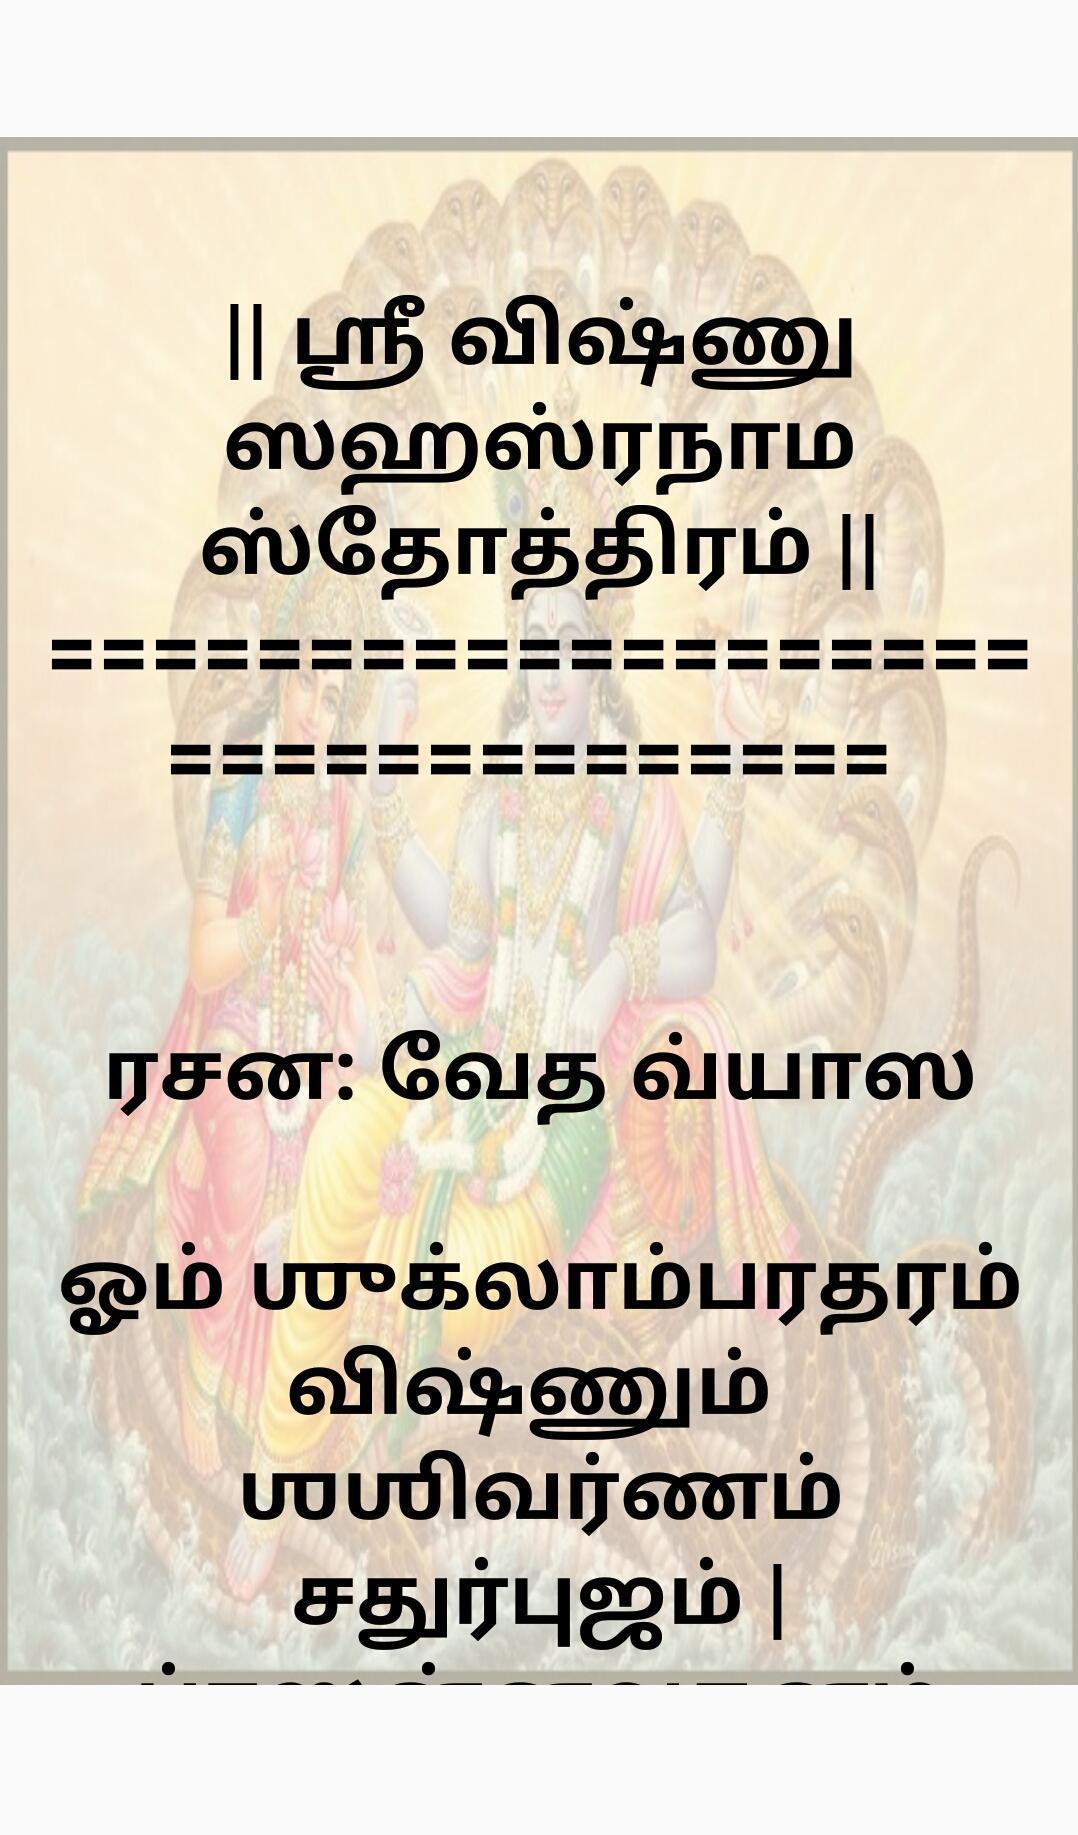 Vishnu Sahasranamam Audio And Tamil Lyrics for Android - APK